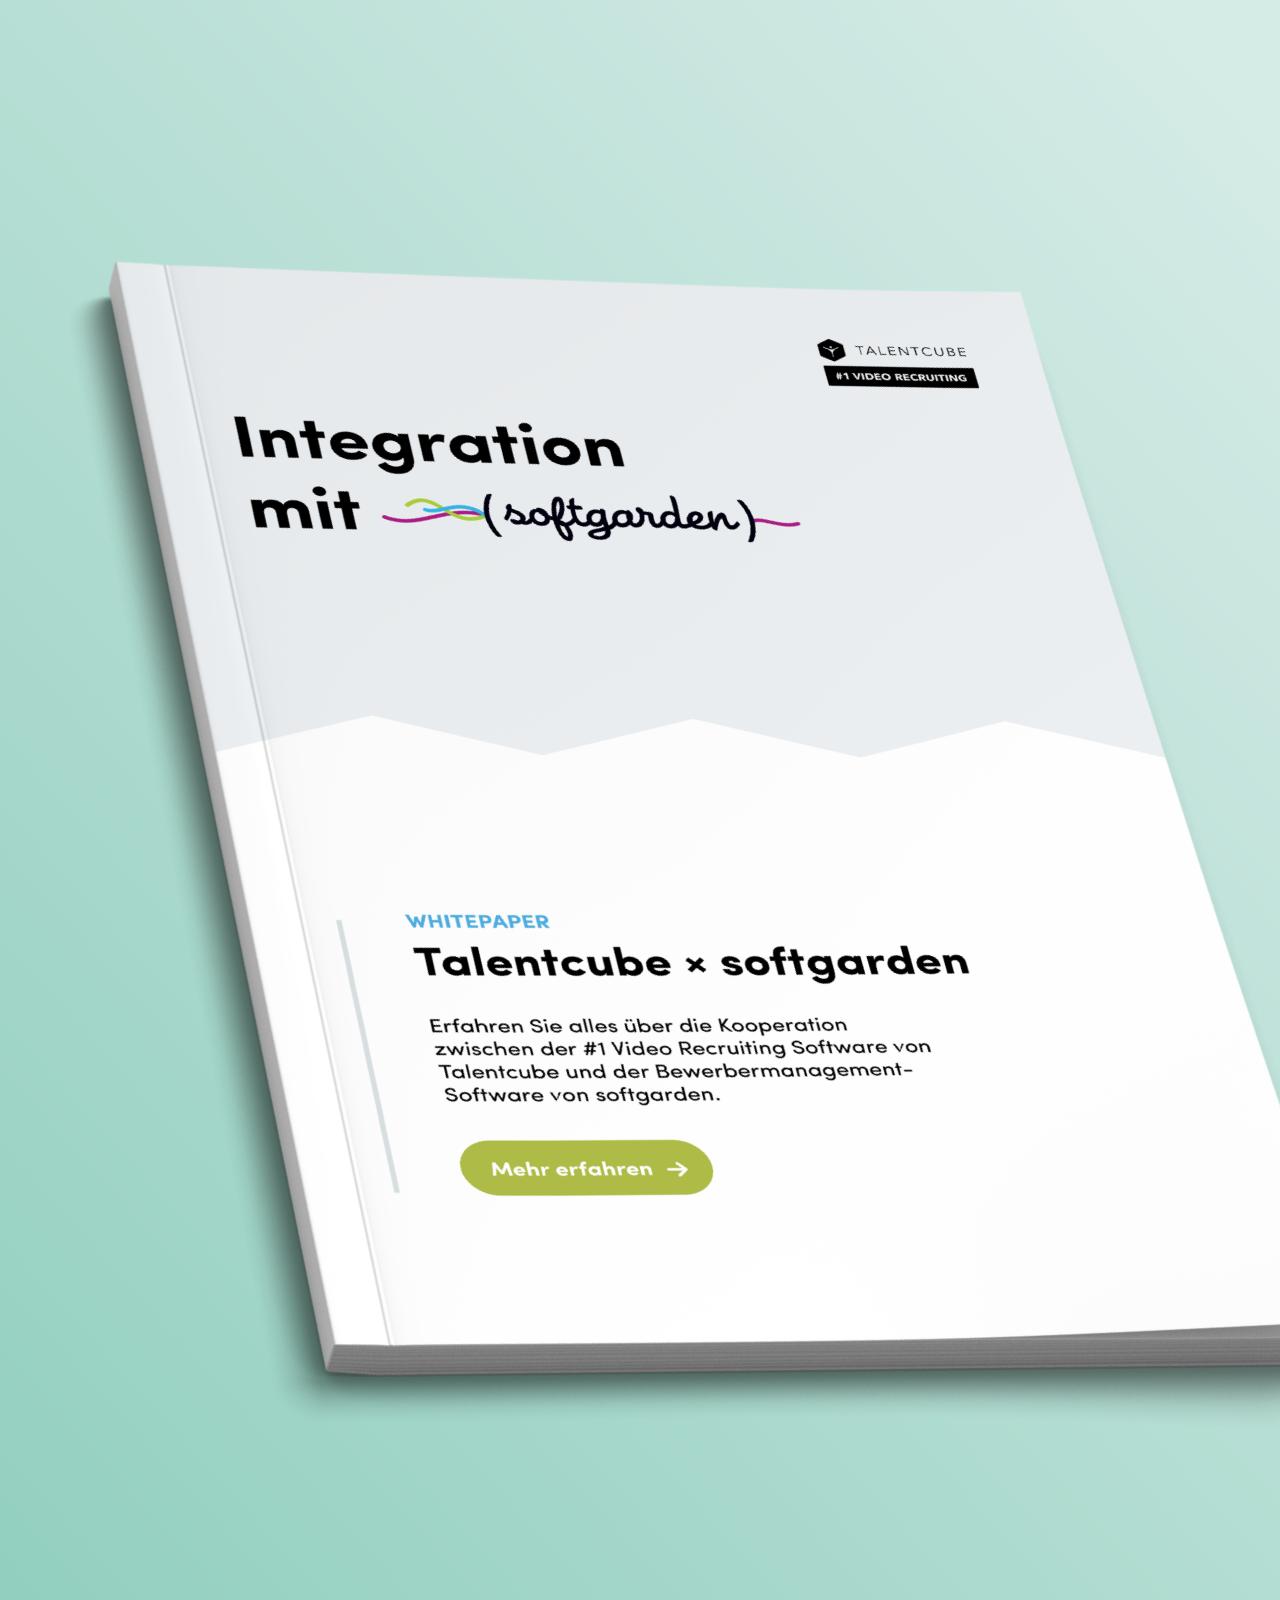 ATS Integration: Talentcube X softgarden